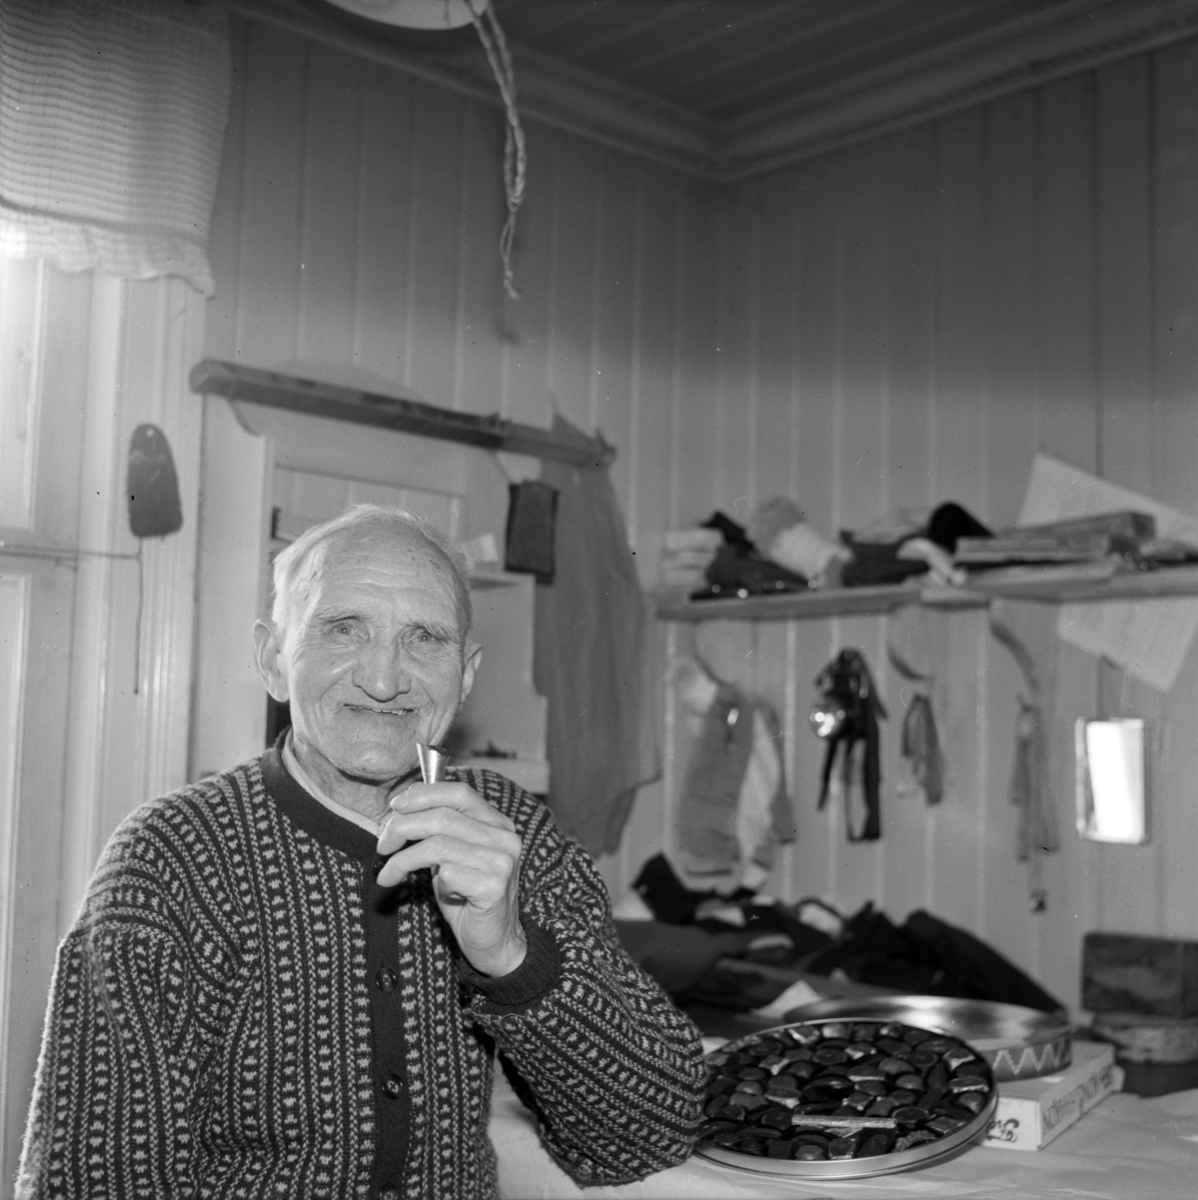 Olaf Larsen